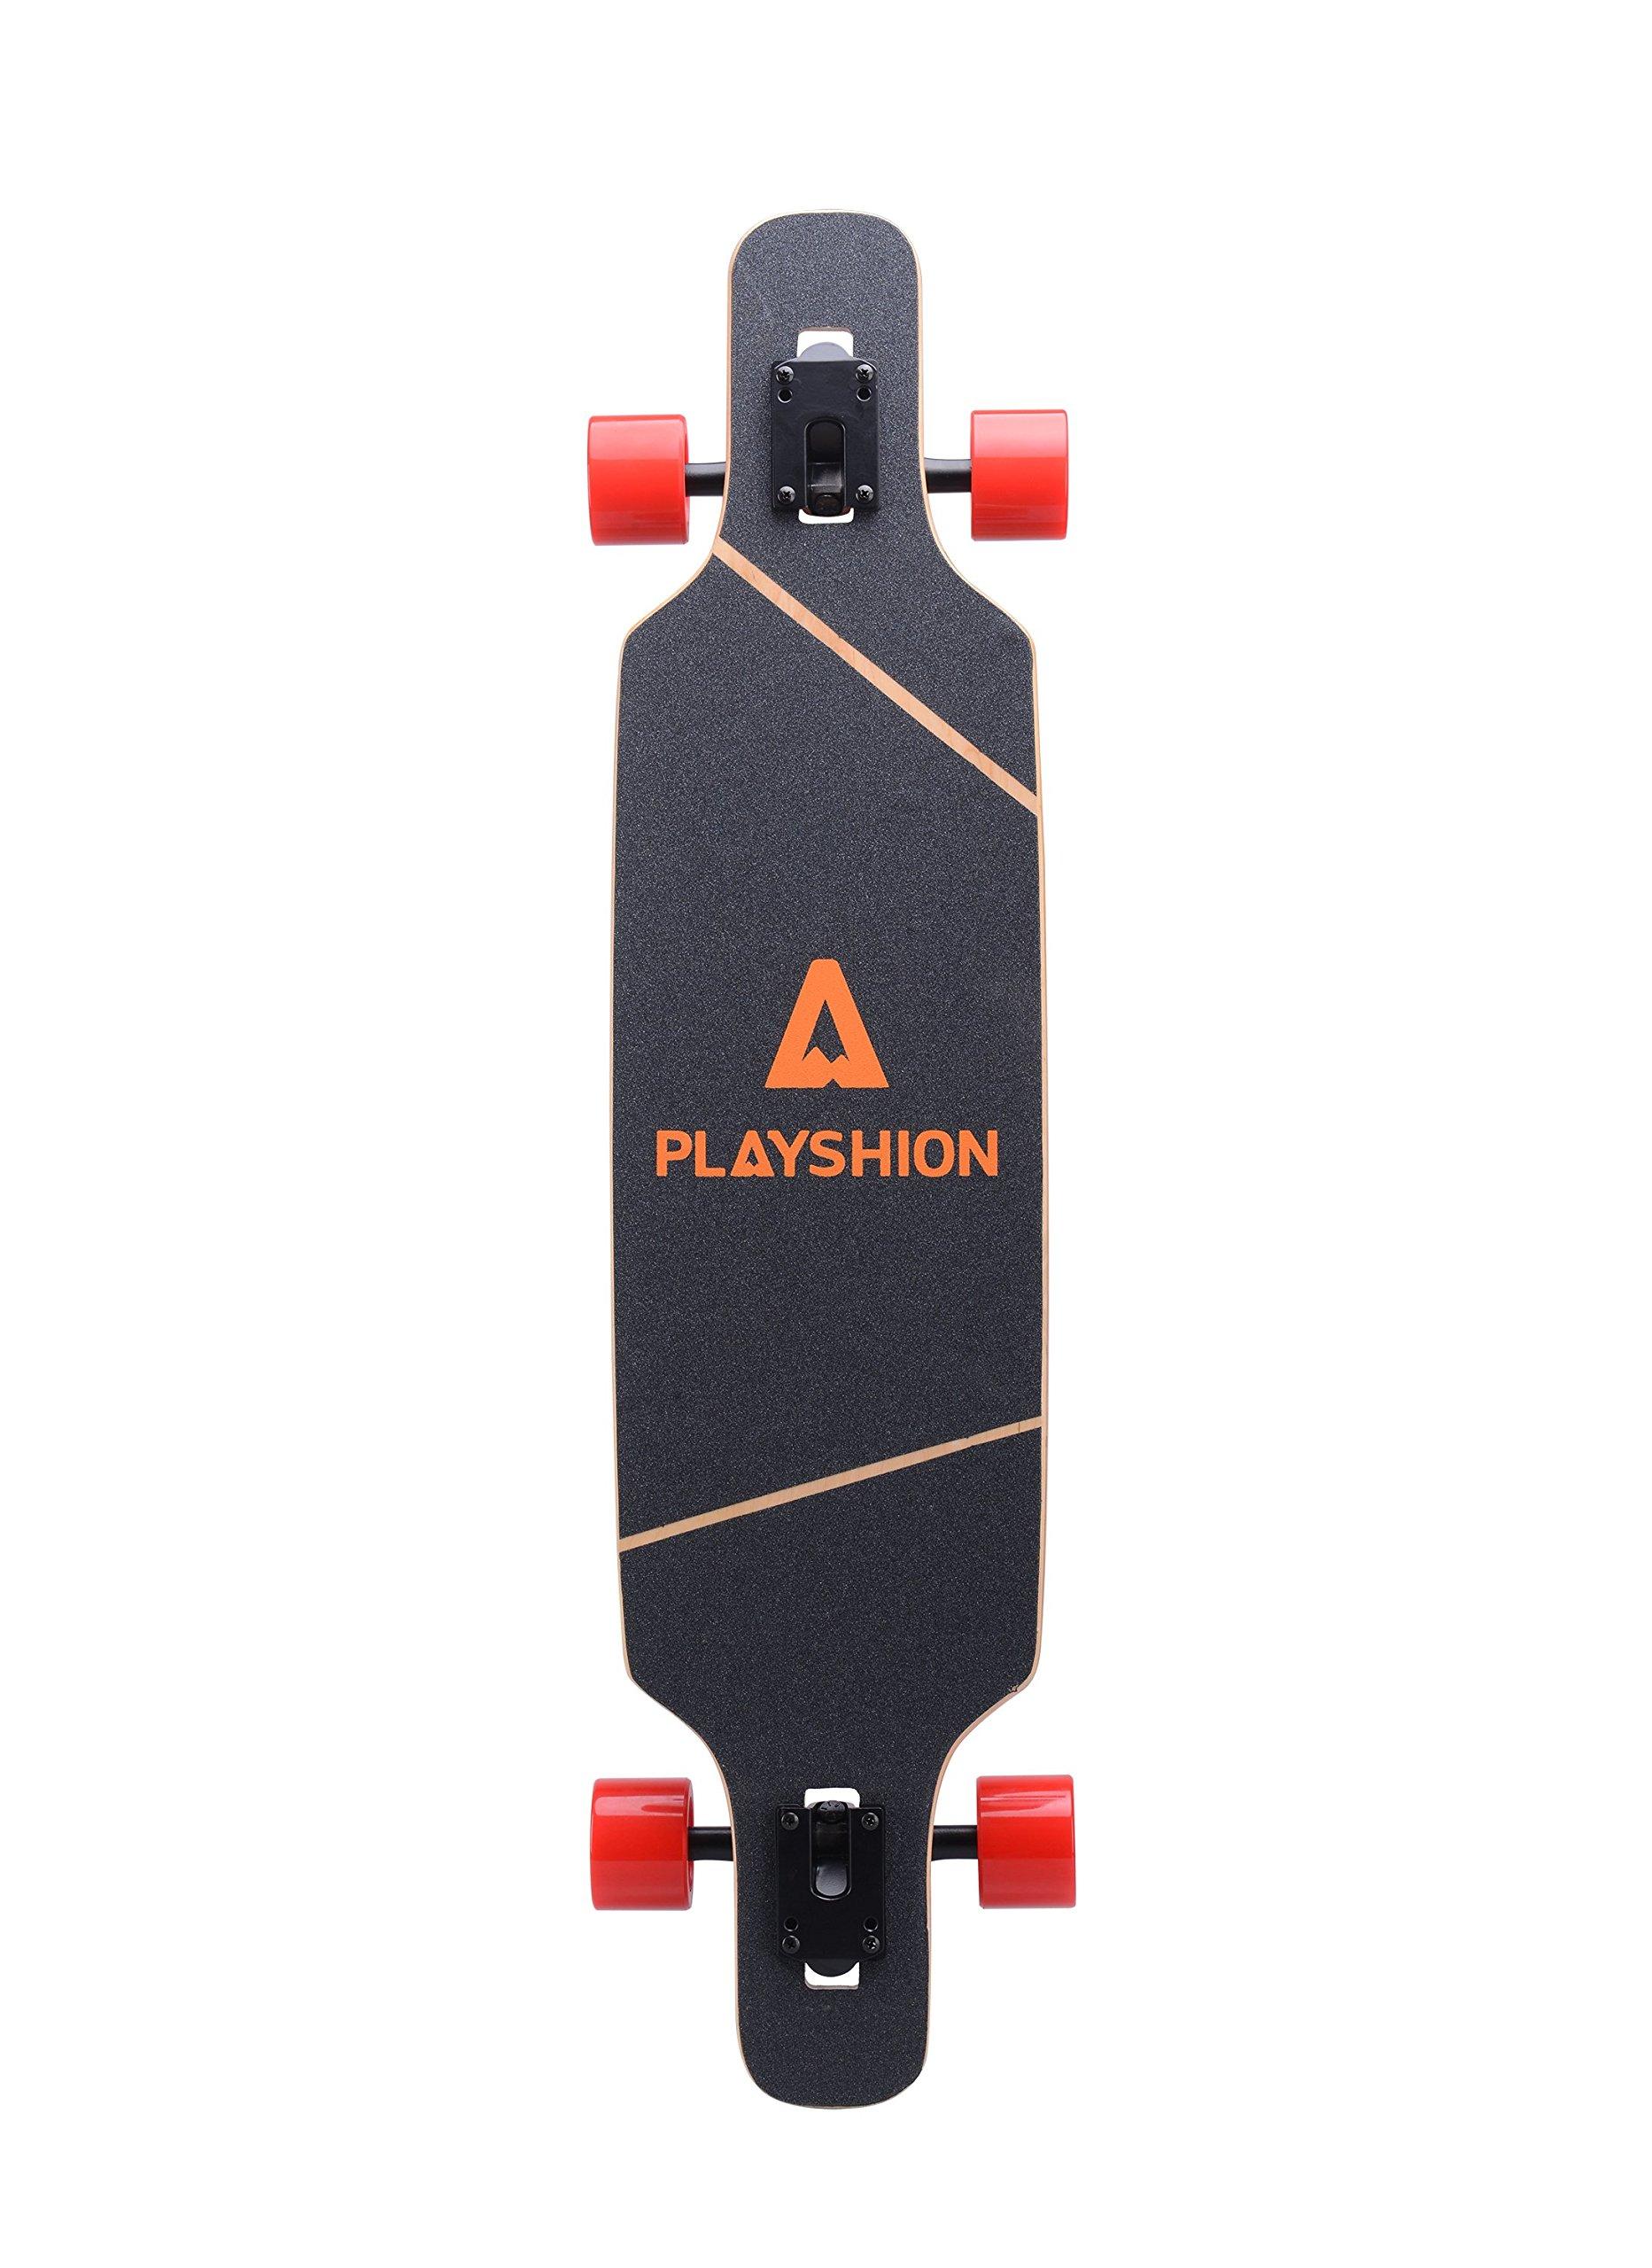 Playshion 39 Inch Drop Through Freestyle Longboard Skateboard Cruiser by Playshion (Image #2)